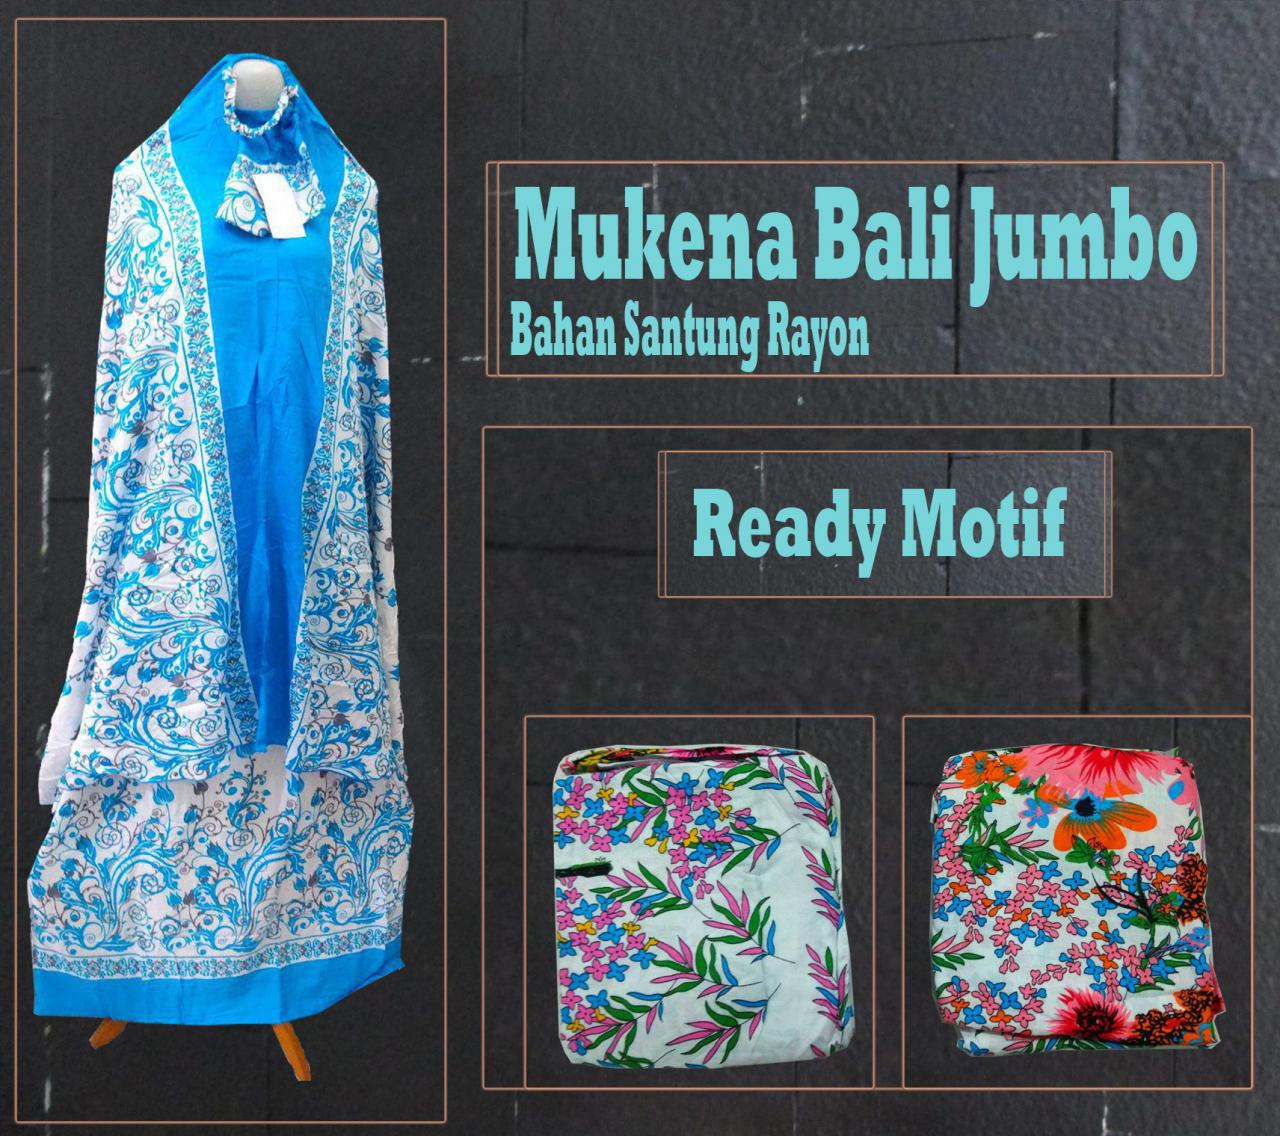 Pusat Grosir Baju Murah Solo Klewer 2021 Produsen Mukena Bali Jumbo Murah 67ribuan